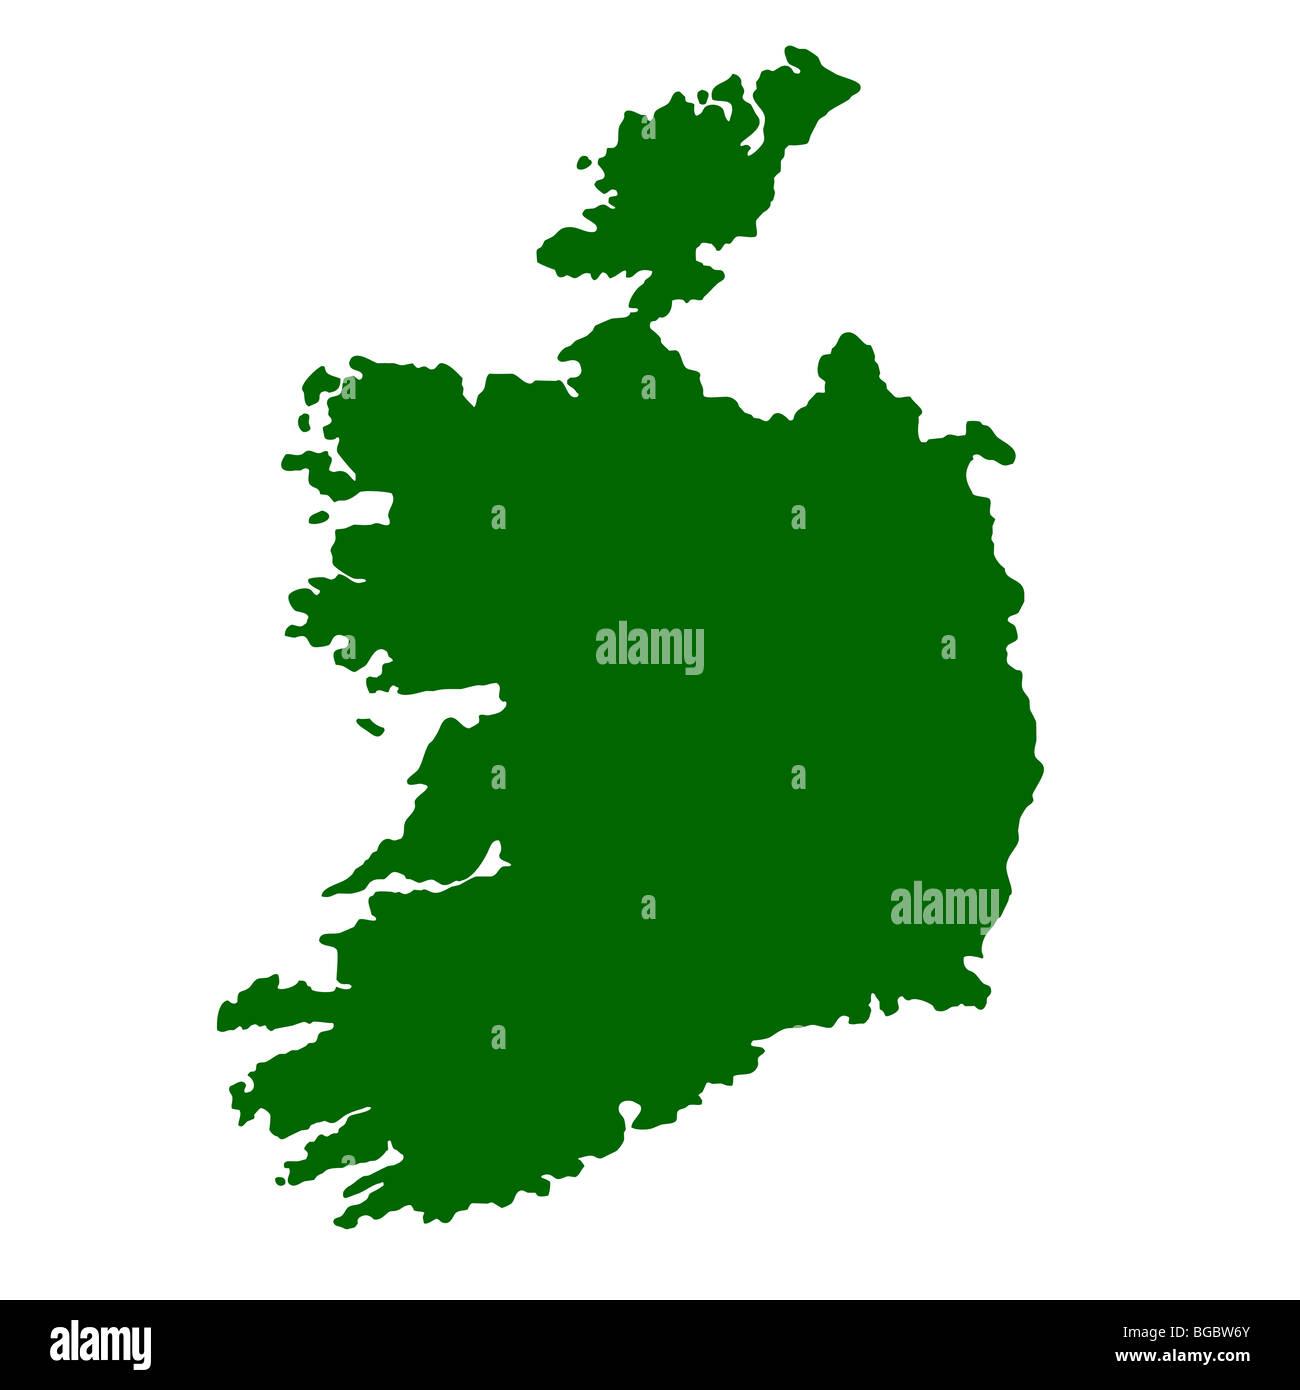 07ca2f4edc3e Ireland Map Stock Photos   Ireland Map Stock Images - Alamy